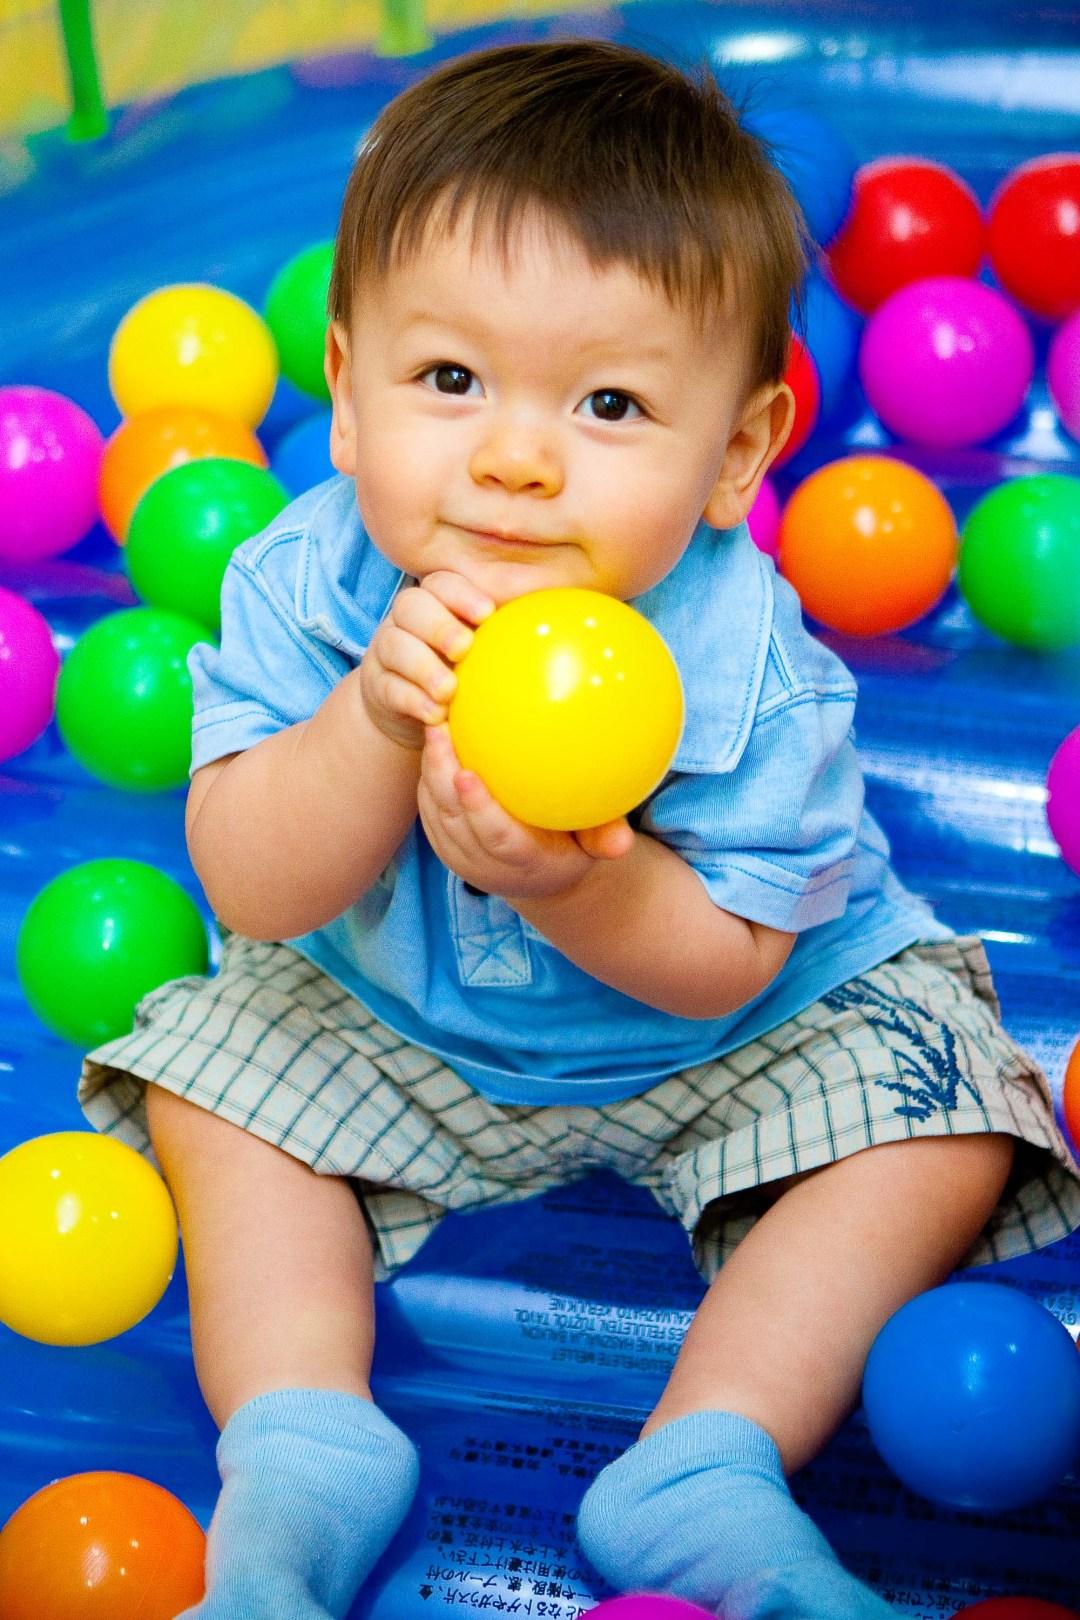 Kid's Birthday Party | Bangkok Thailand